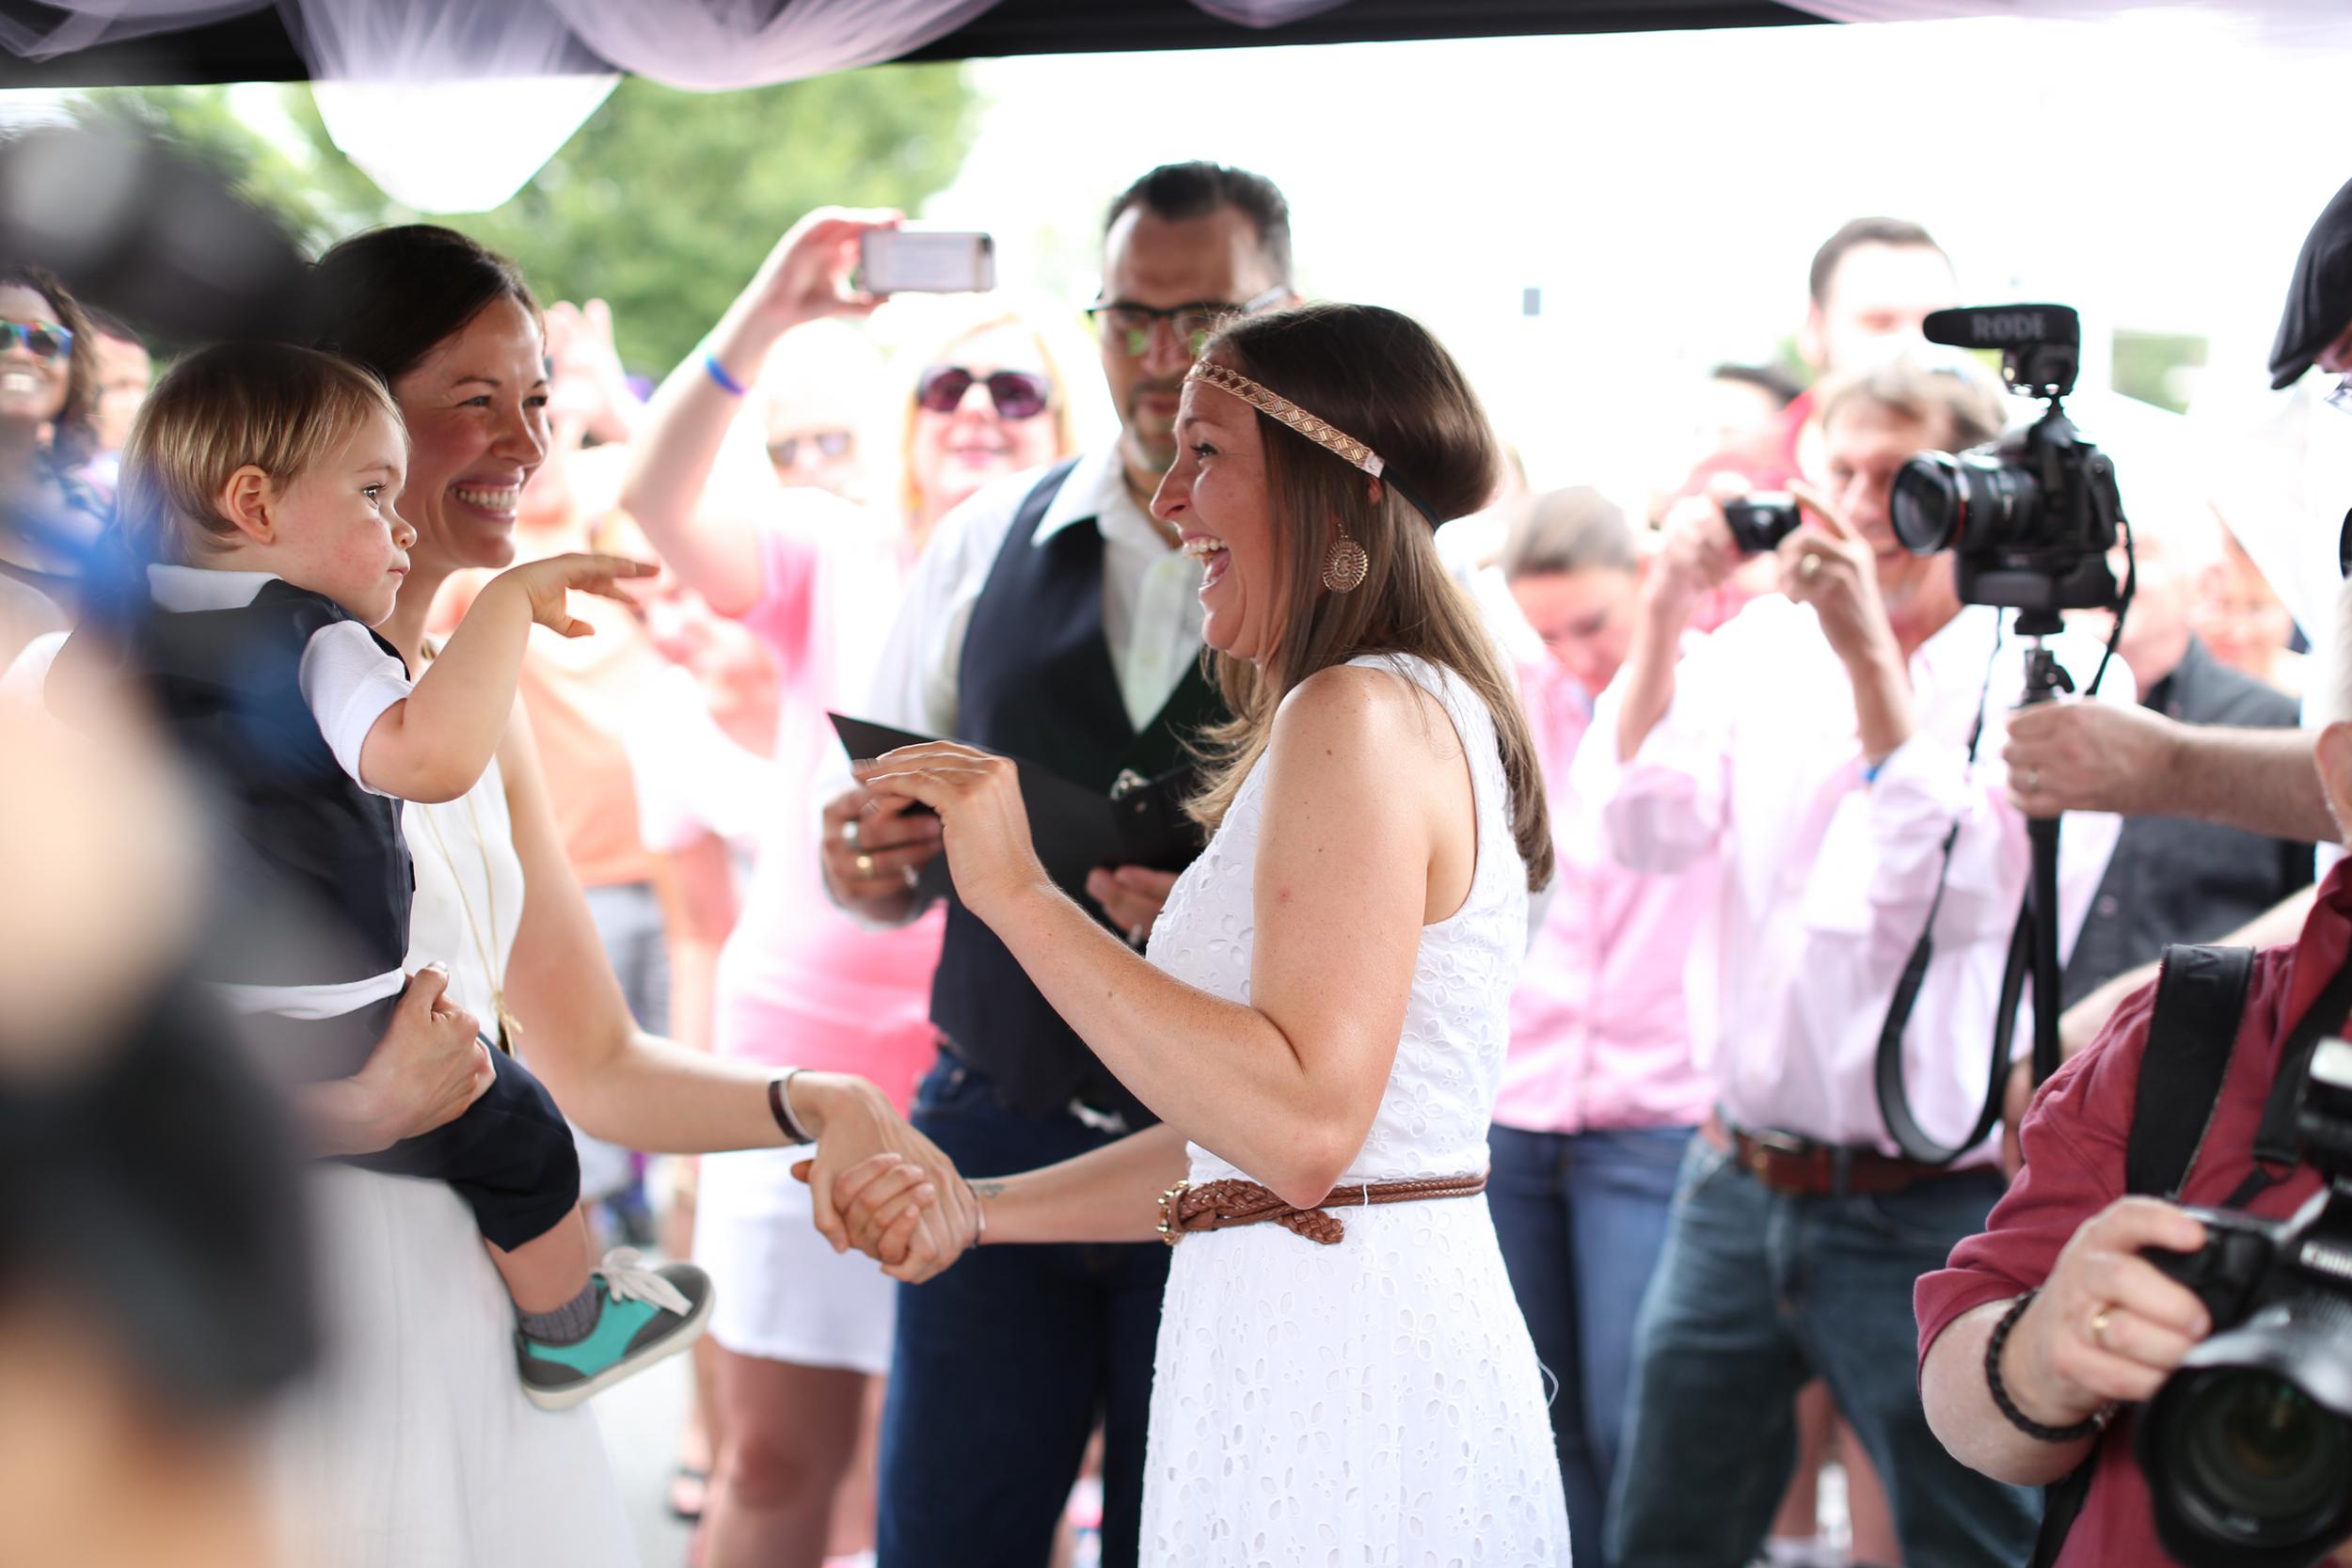 FEVA TAPROOM MARRIAGE CELBRATION SCOTUS RULING 2015 WEBSITE  (43 of 91).jpg